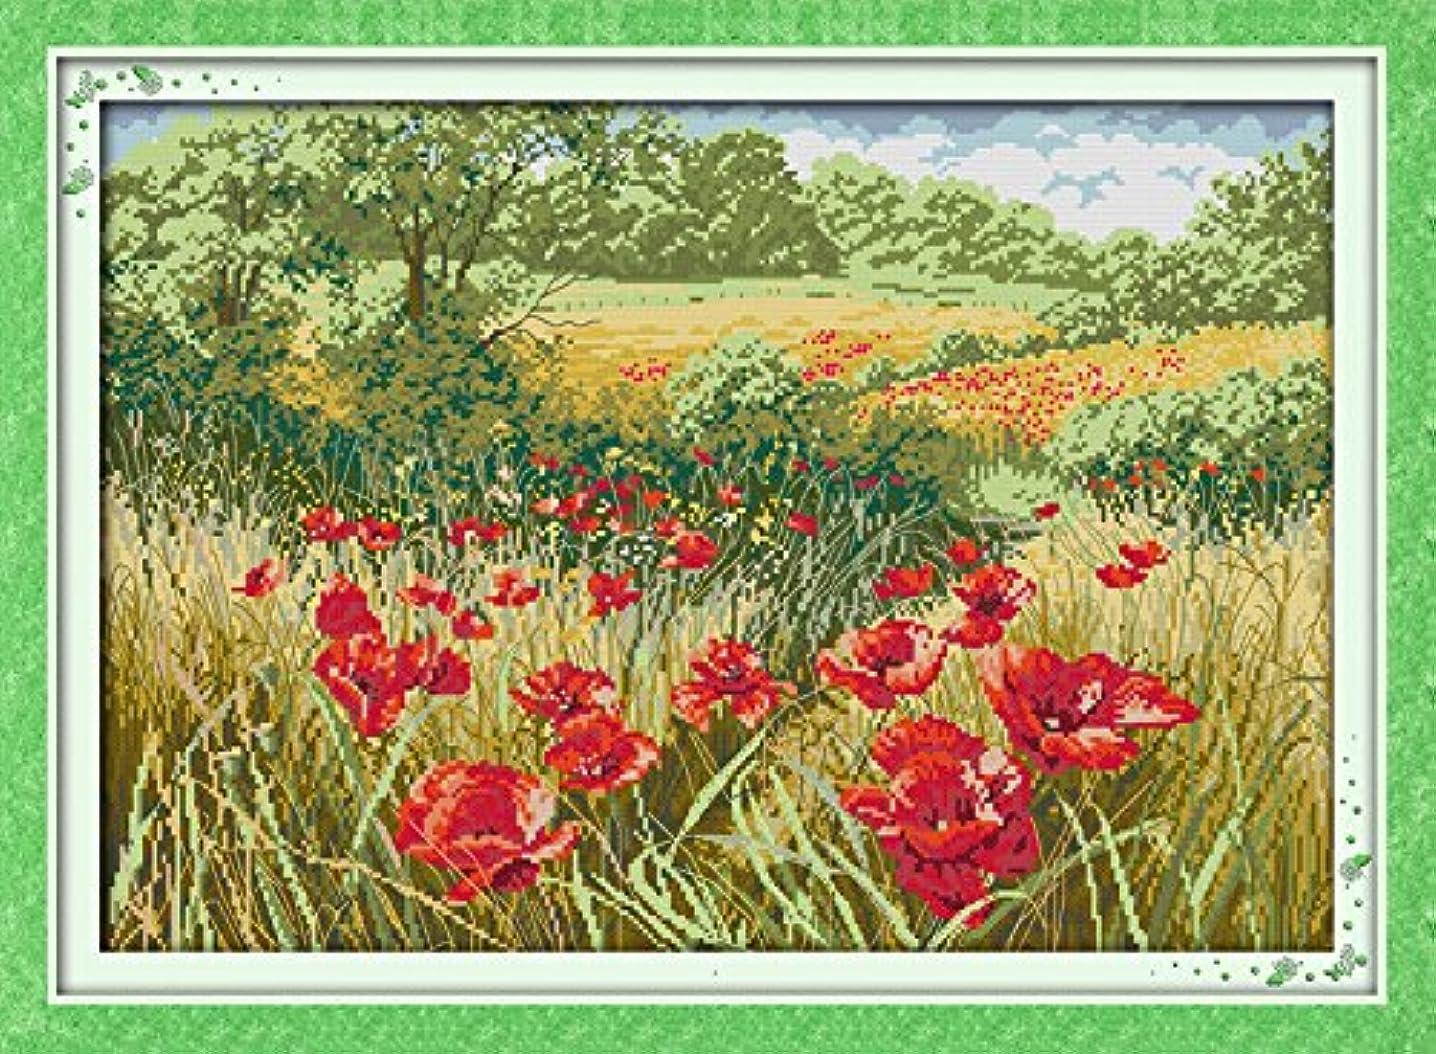 Joy Sunday Cross Stitch Kit 14CT Stamped Embroidery Kits Precise Printed Needlework- Beautiful Flowers (1) 59×43CM